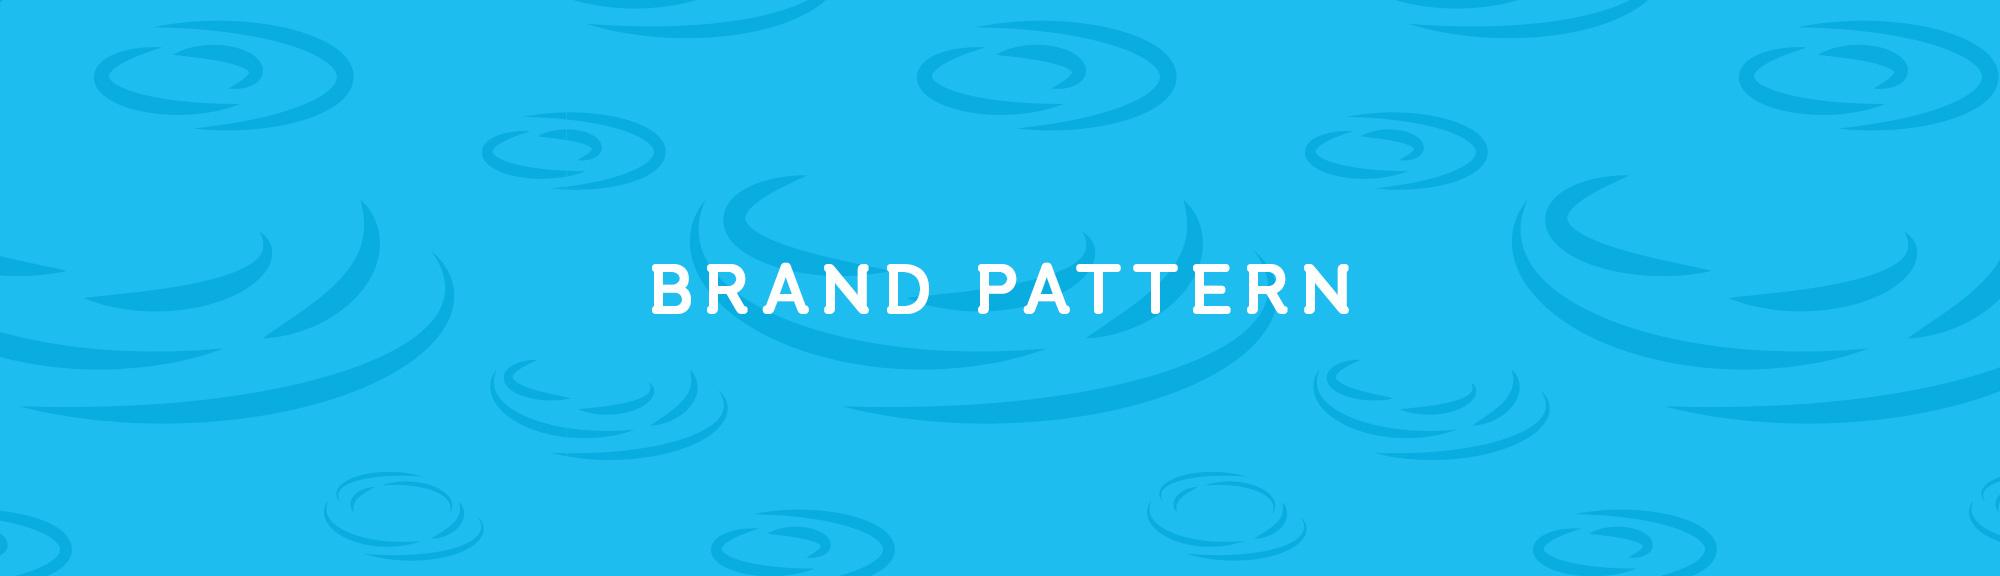 NECO-Branding-brand-pattern2